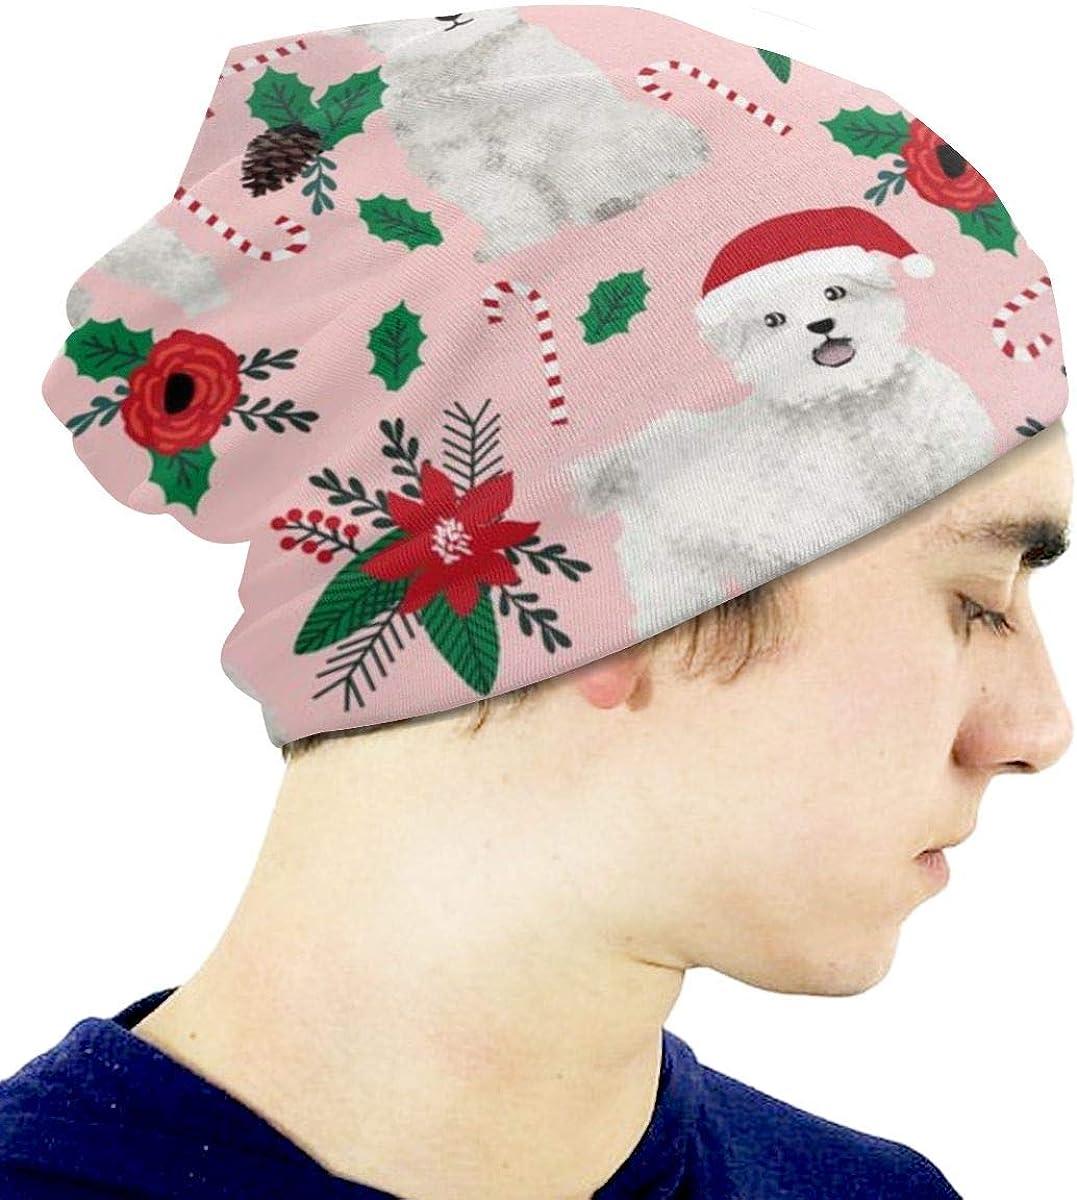 Maltese Poinsettia Pink MEROU Kids Winter Knit Warm Hats Children Baby Beanie Skull Cap for Girls Boys